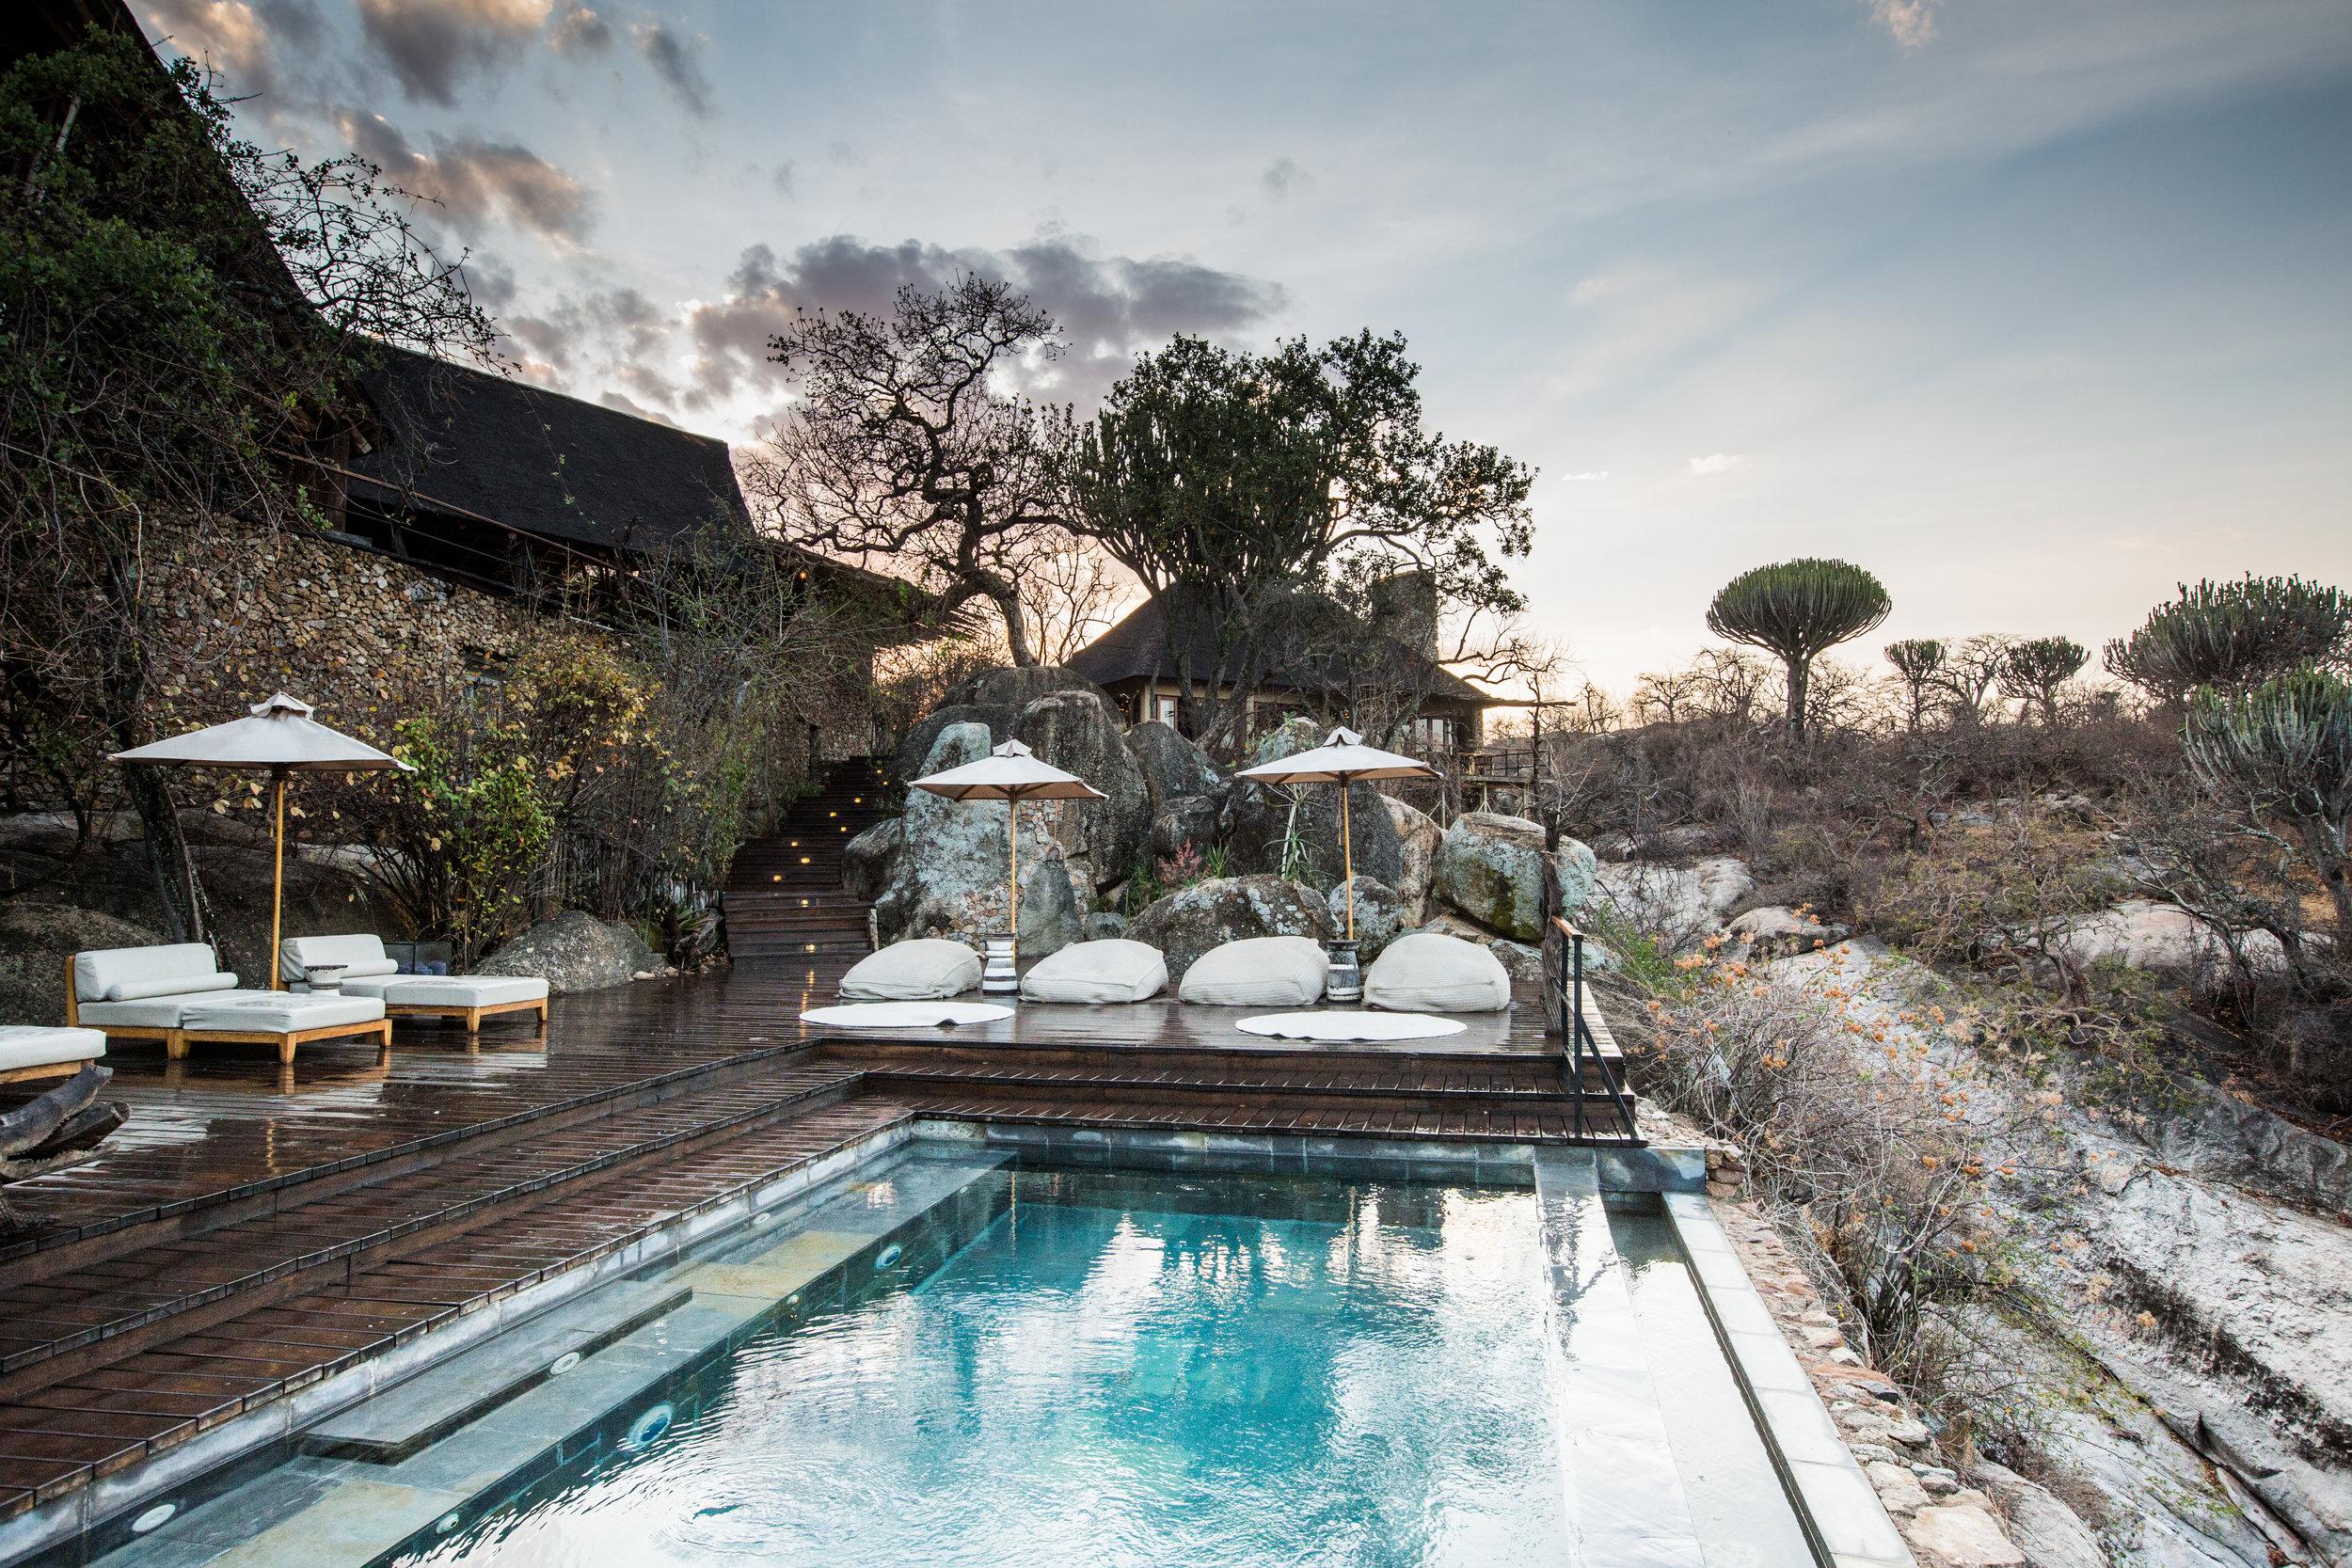 legendary expeditions - mwiba lodge